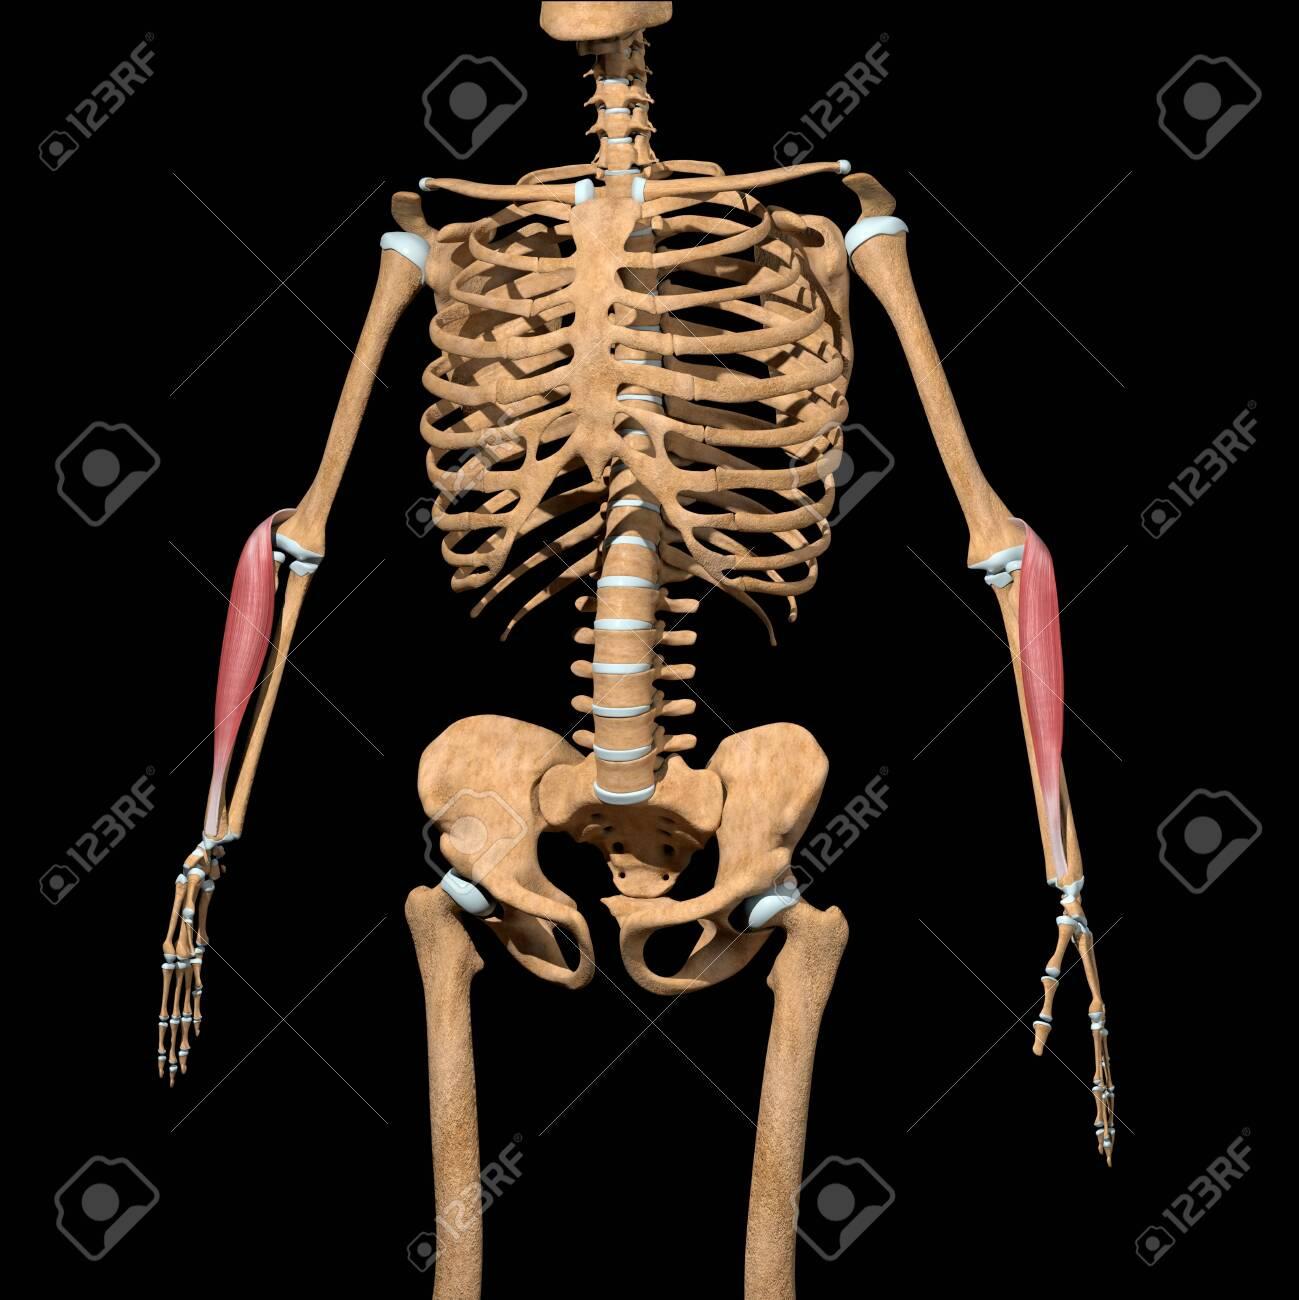 This 3d illustration shows the brachioradialis Lumborum muscles on skeleton - 142009940